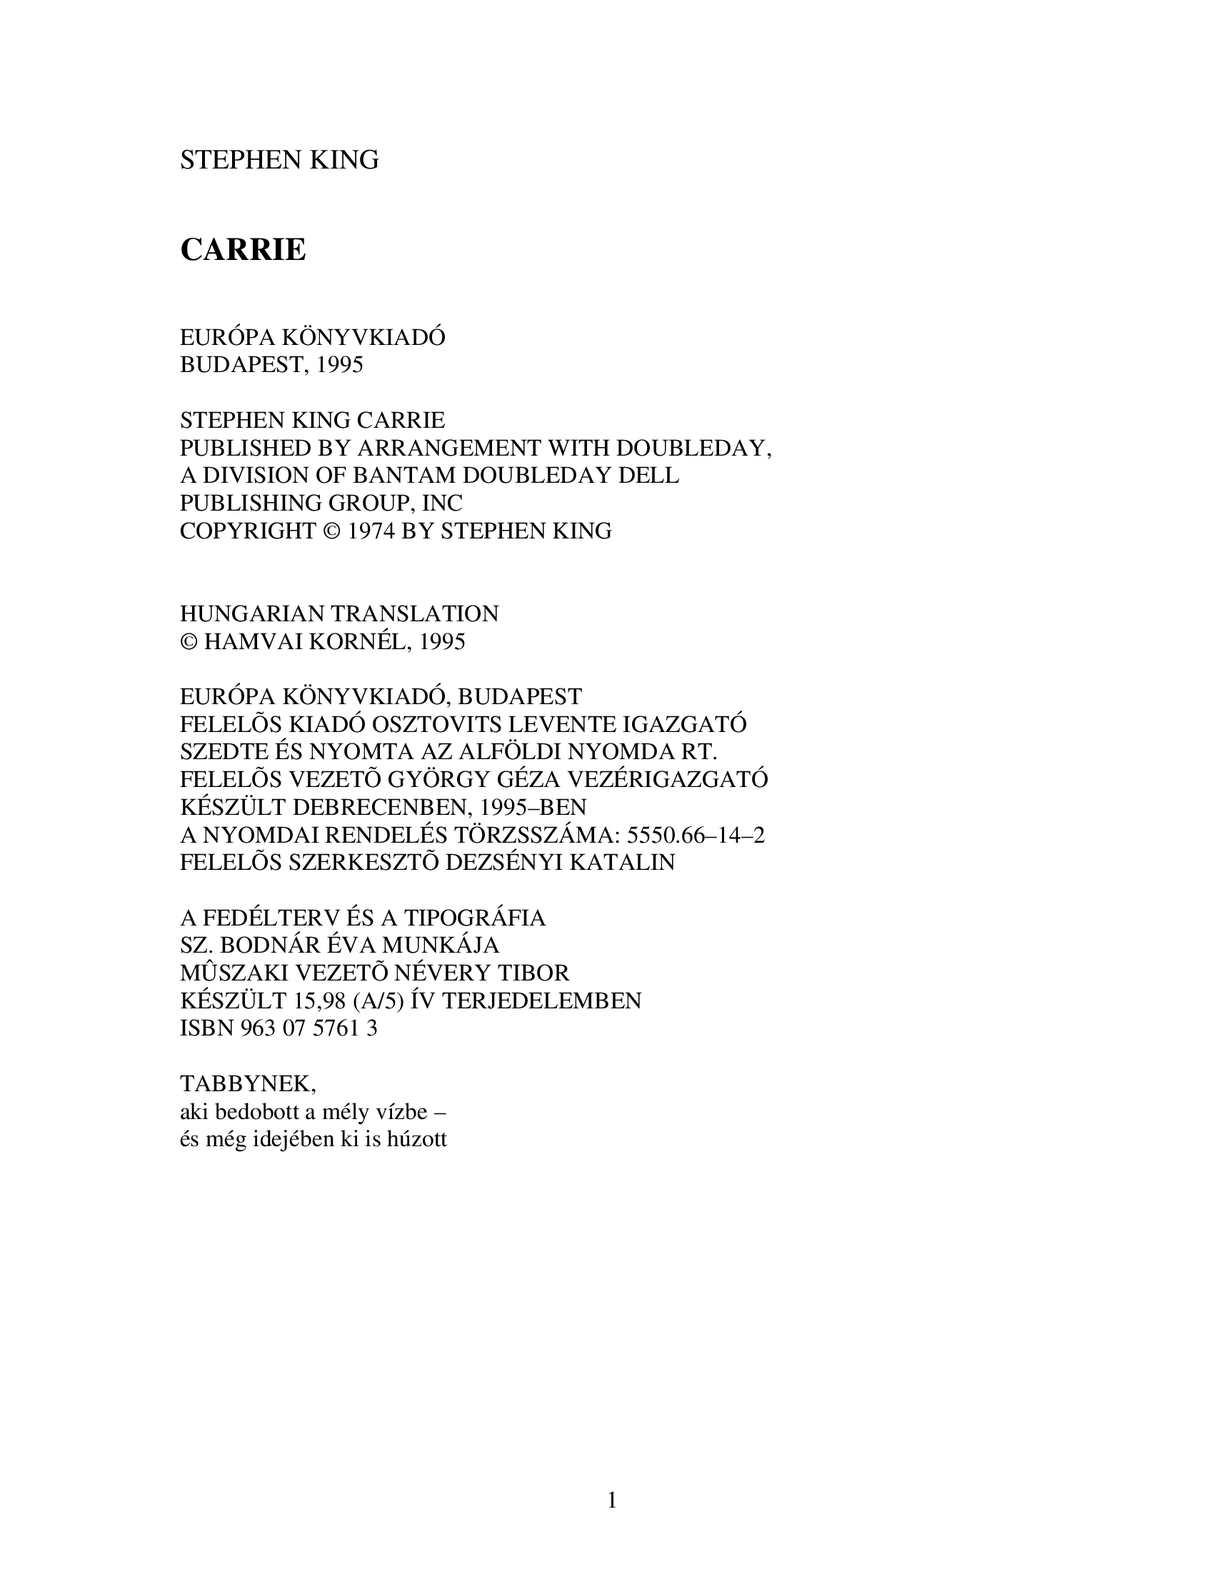 Calaméo - Stephen King - Carrie 23bff68179